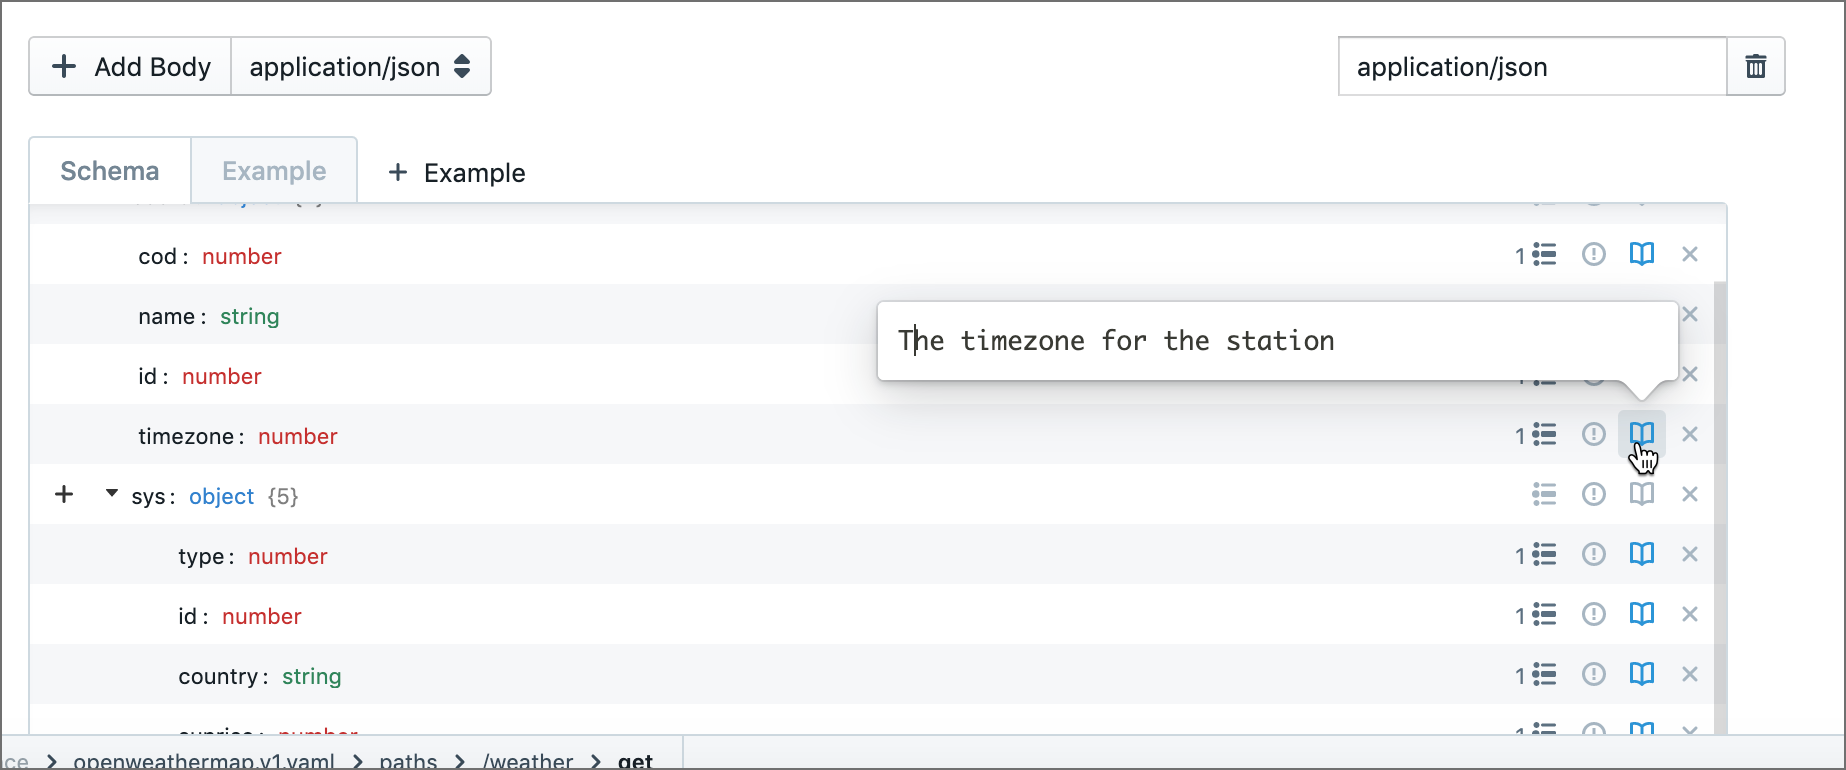 Entering descriptions in the GUI editor